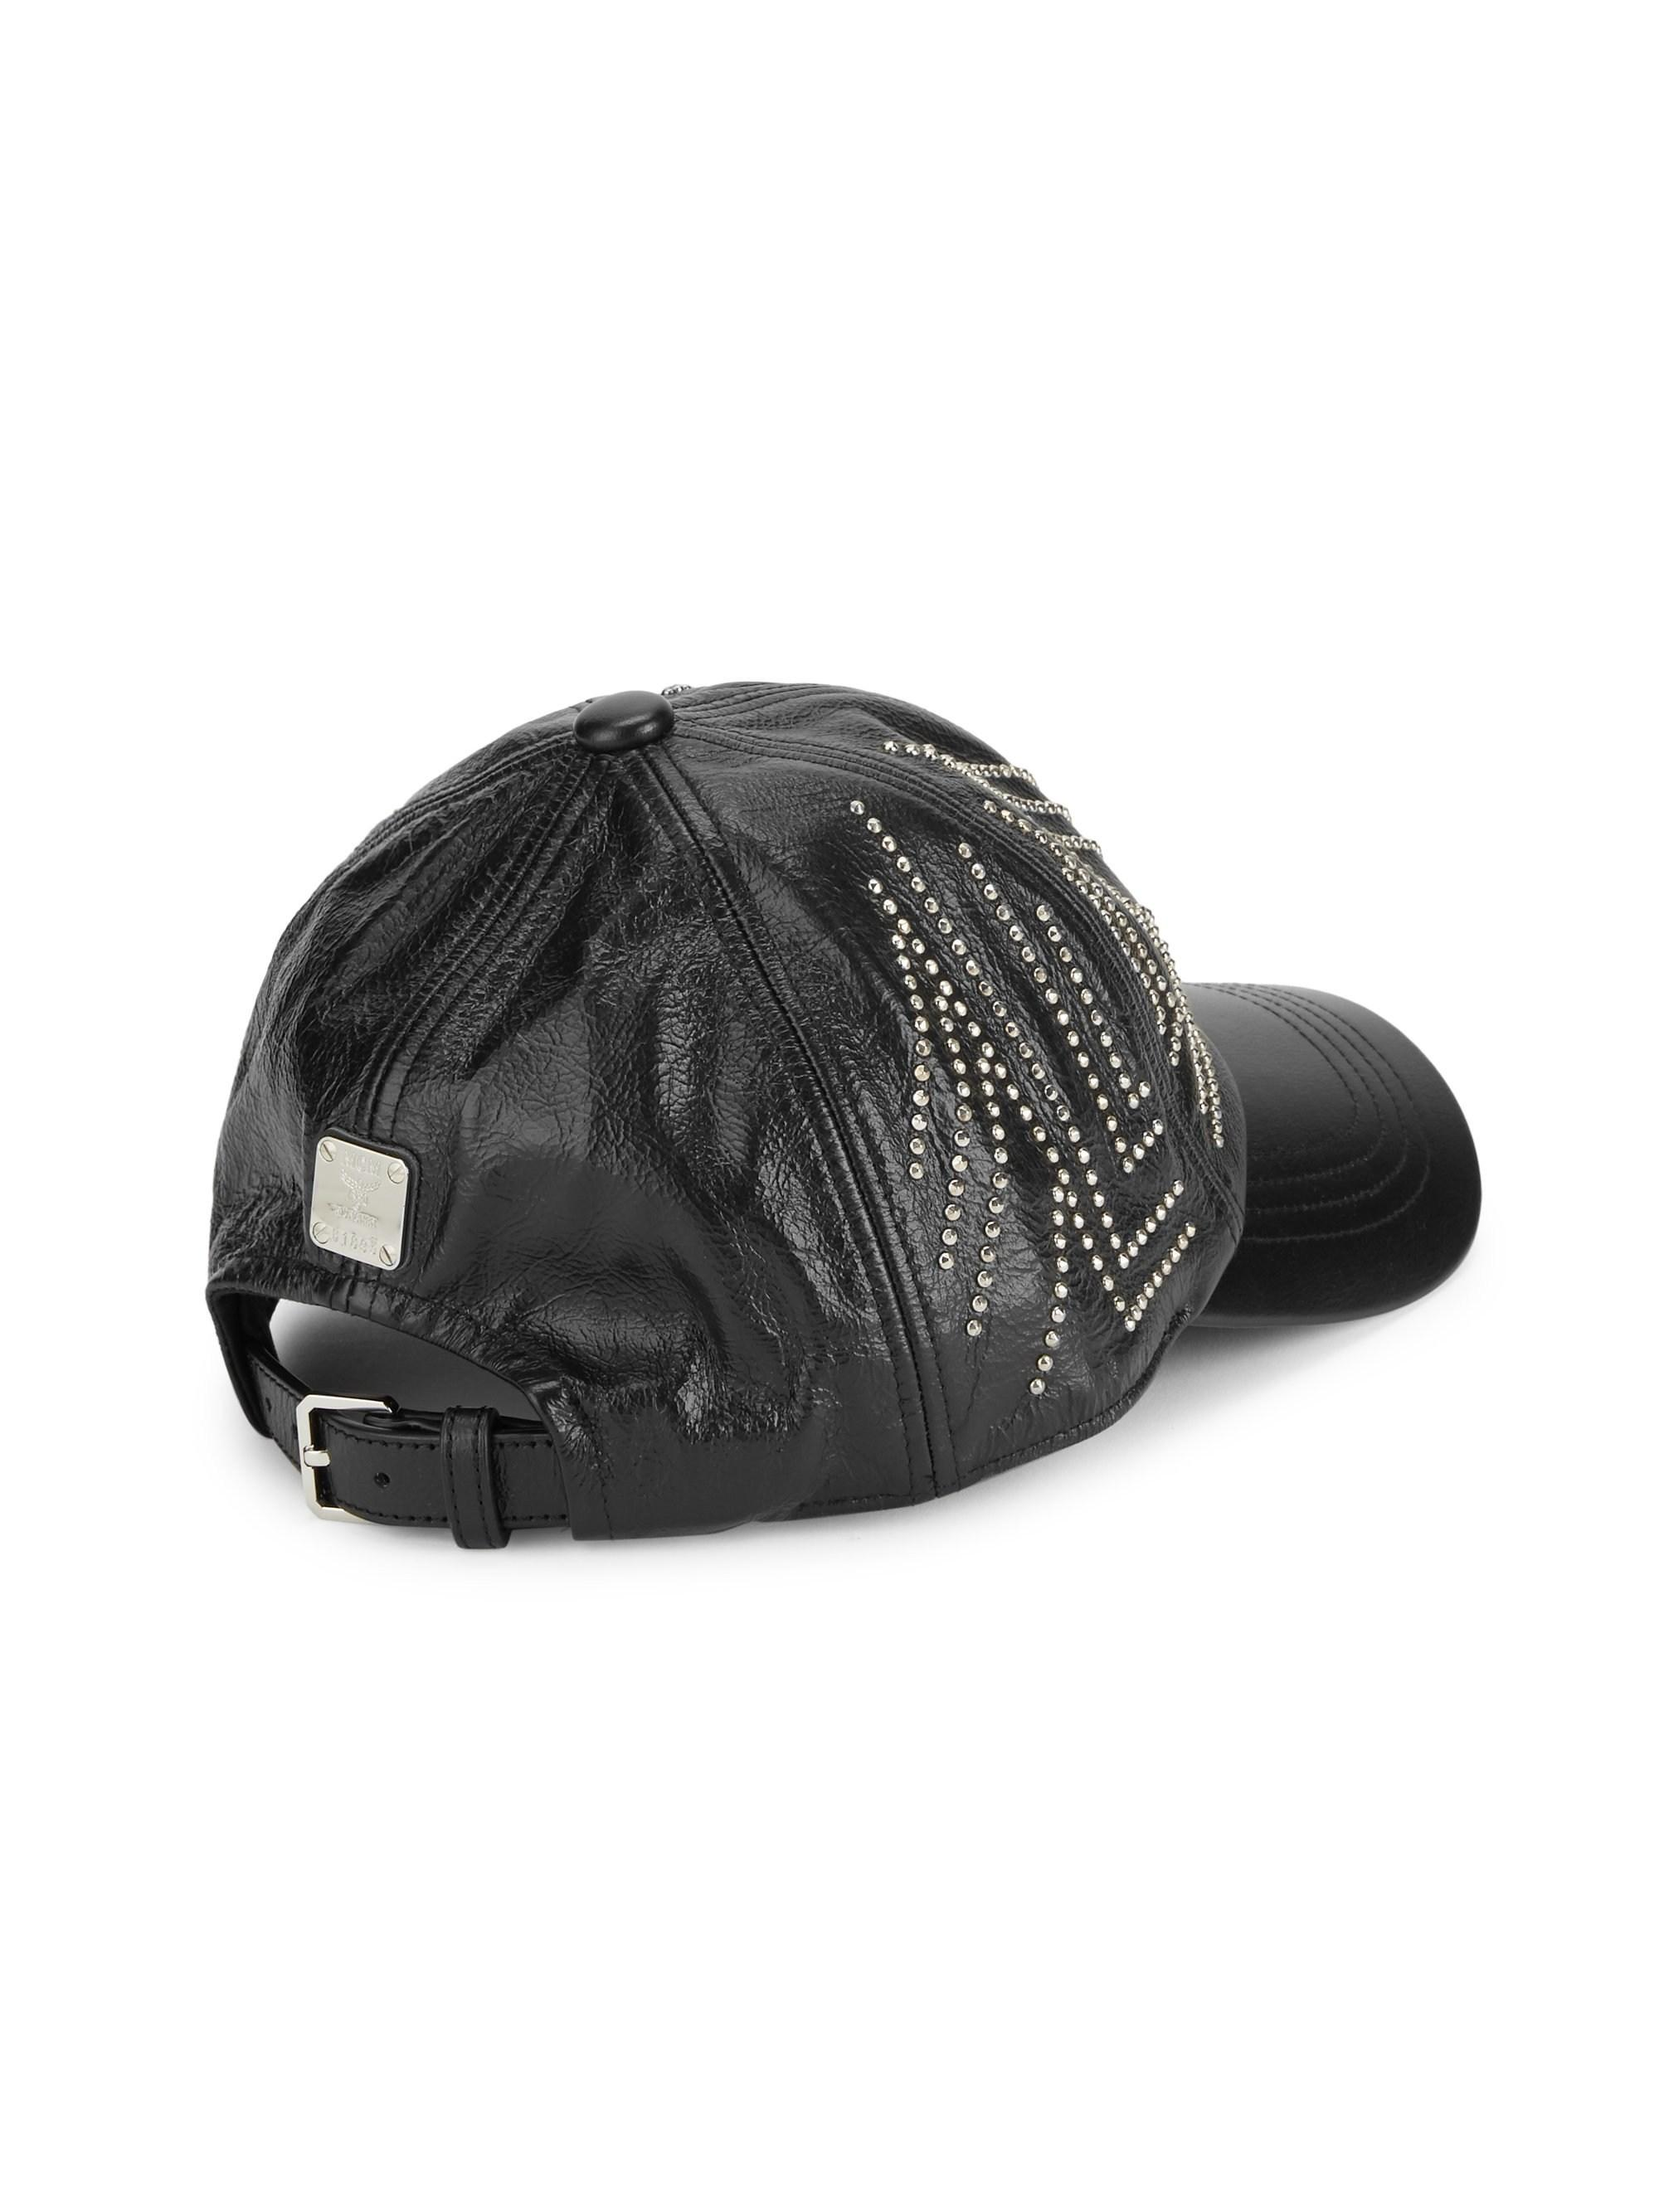 83c1c9dd57e Lyst - MCM Men s Gunta Stud Leather Baseball Cap - Black in Black ...